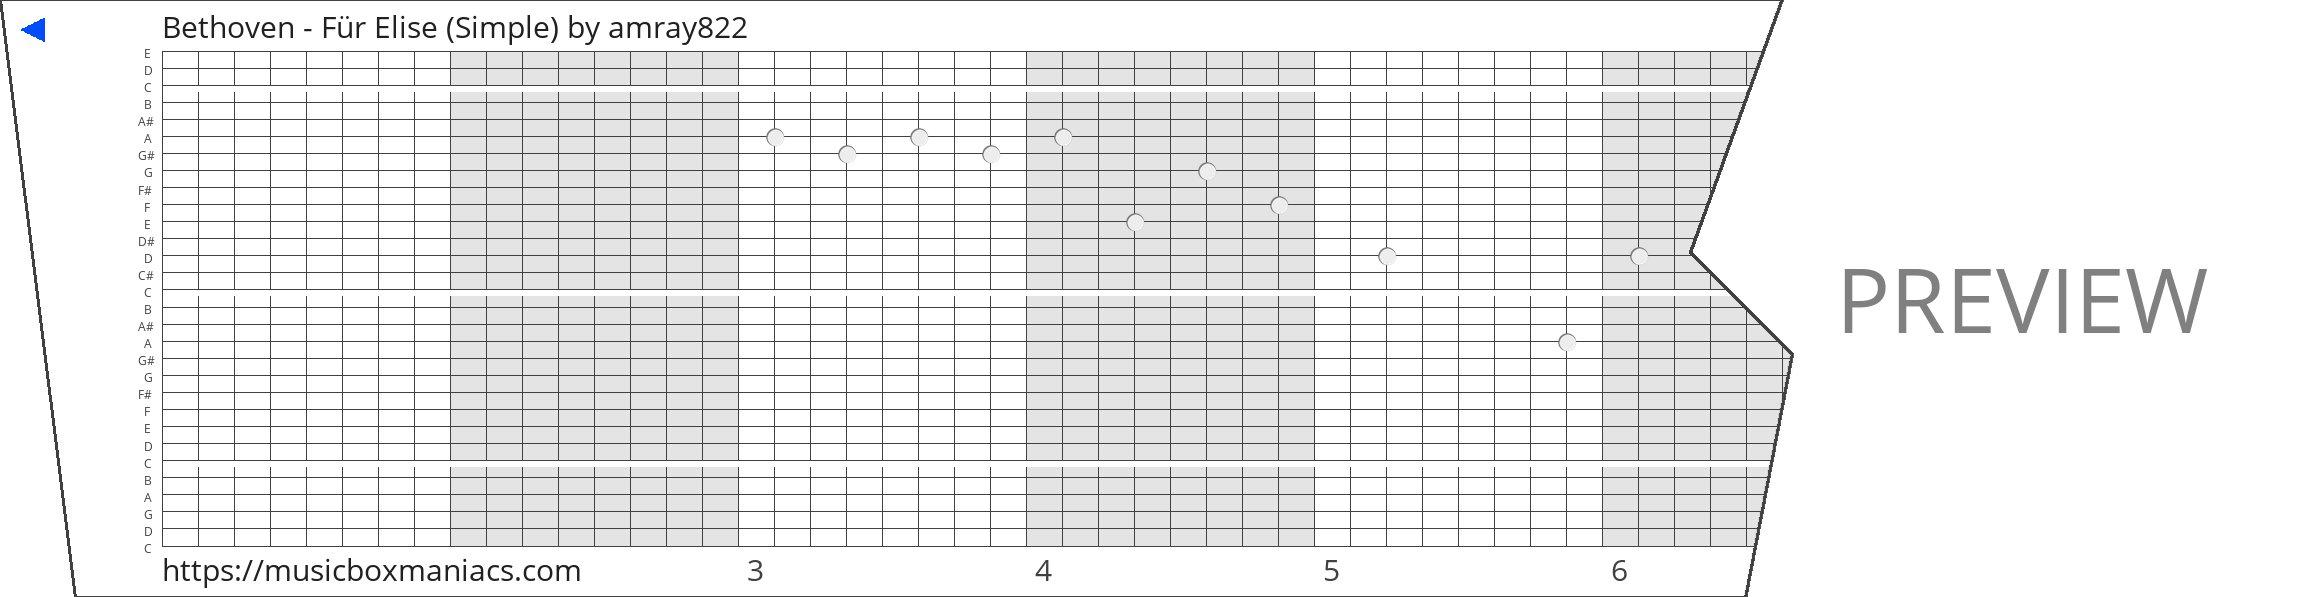 Bethoven - Für Elise (Simple) 30 note music box paper strip